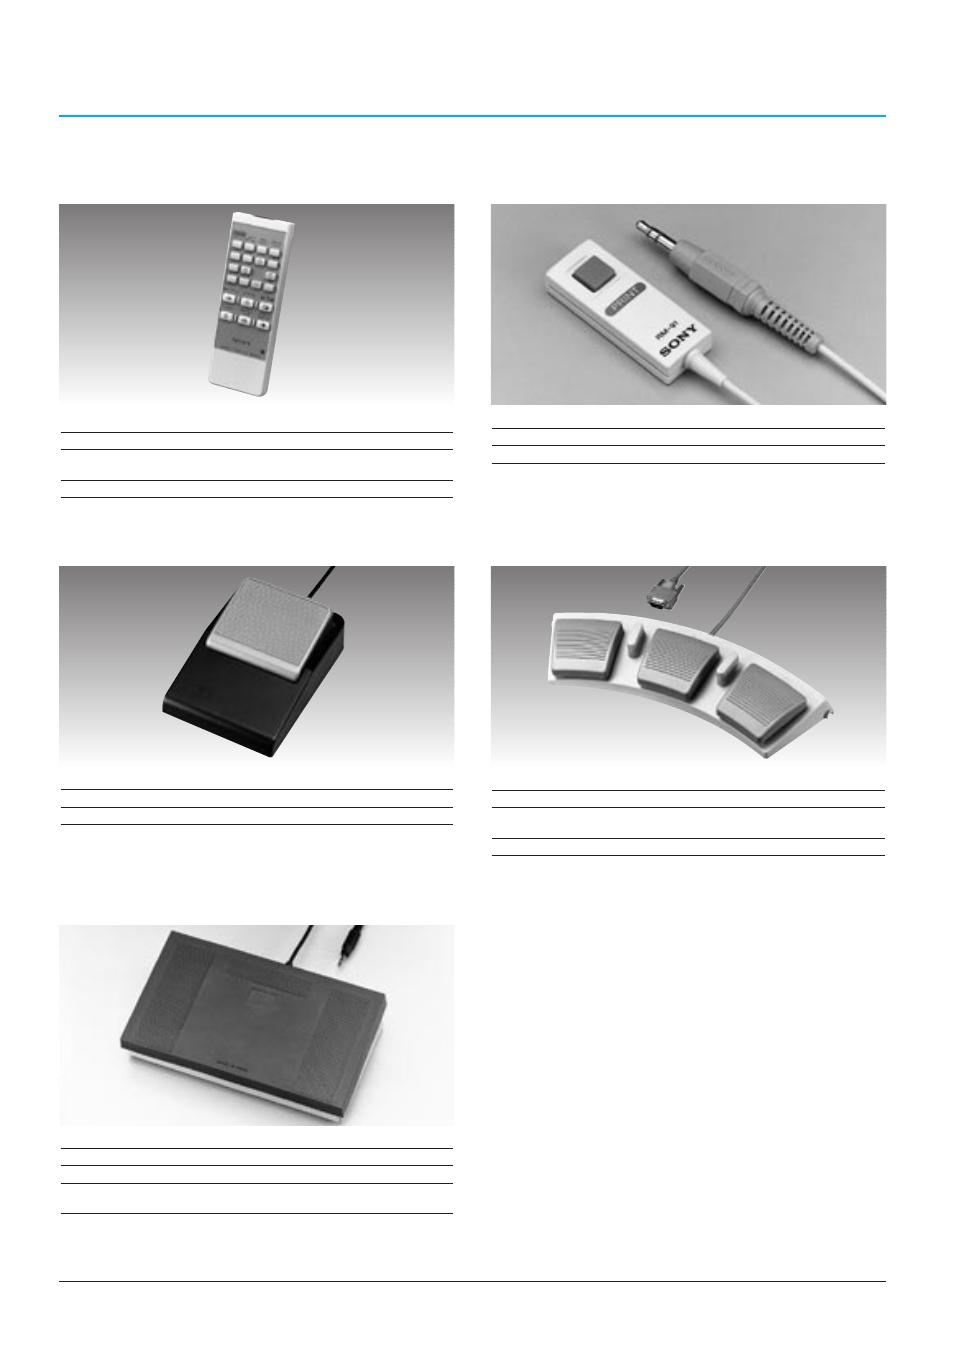 rm 5500 rm 91 fs 30 sony cctv systems user manual page 66 75 rh manualsdir com User Manual Template Instruction Manual Book